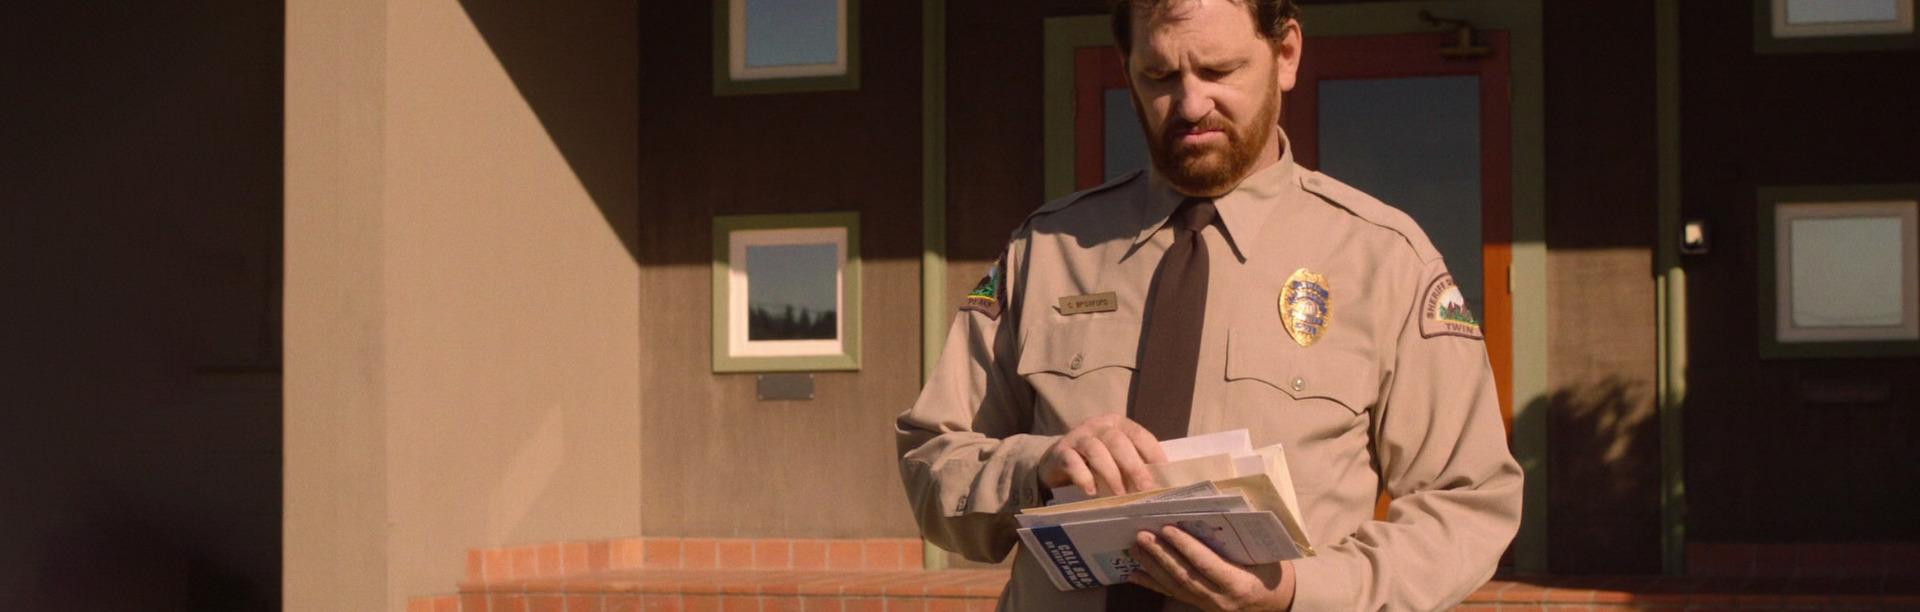 Twin Peaks Rewatch 54